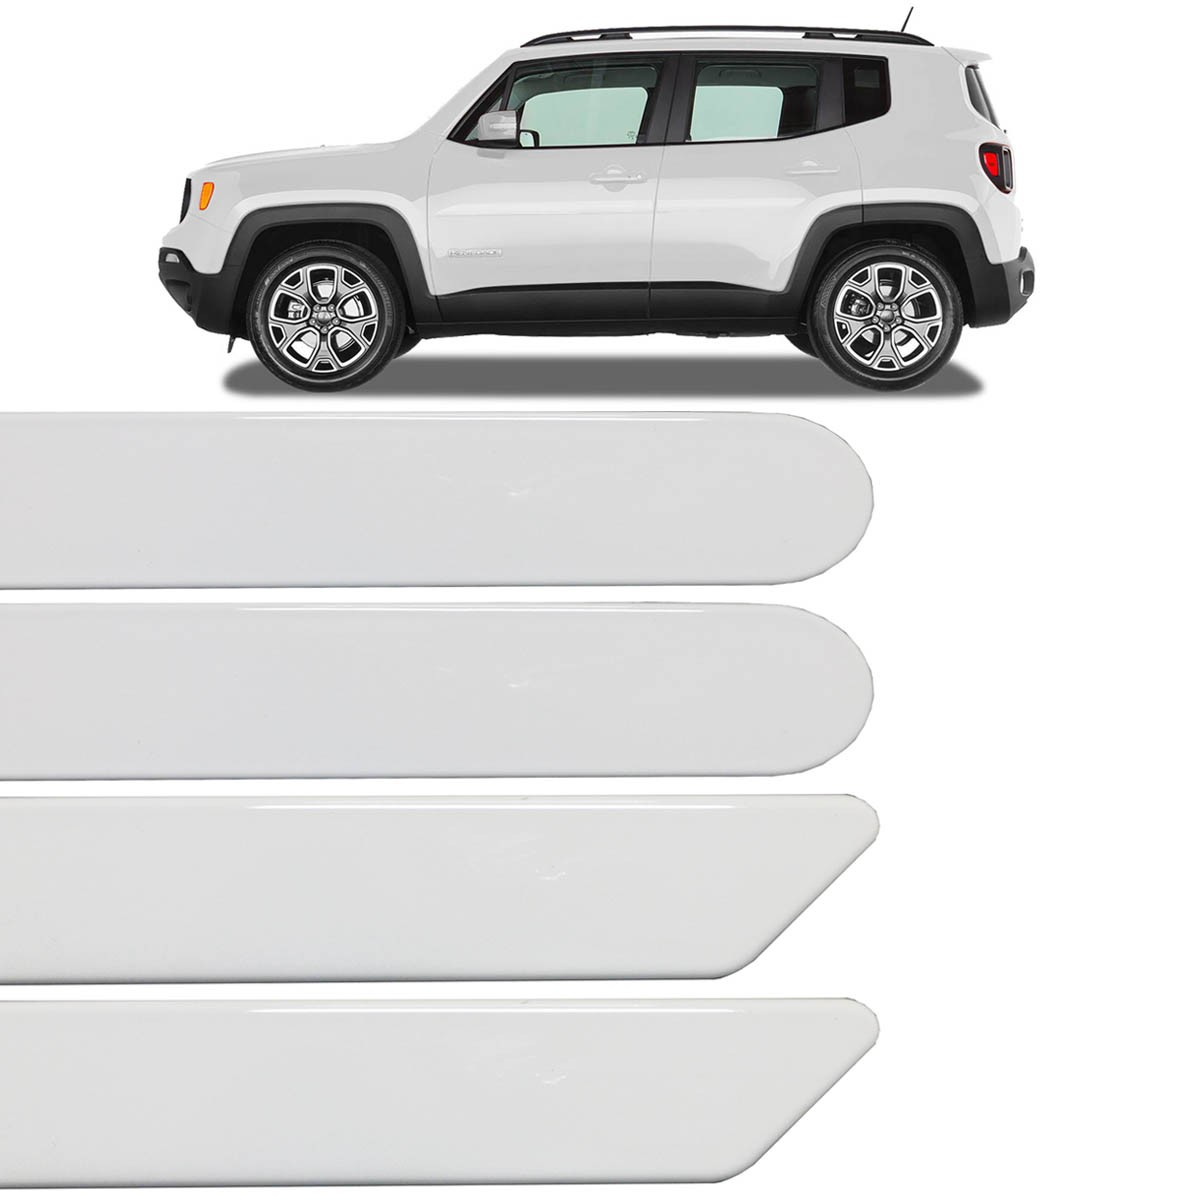 Jogo Friso Lateral Jeep Renegade 2015 2016 2017 Branco Ambiente